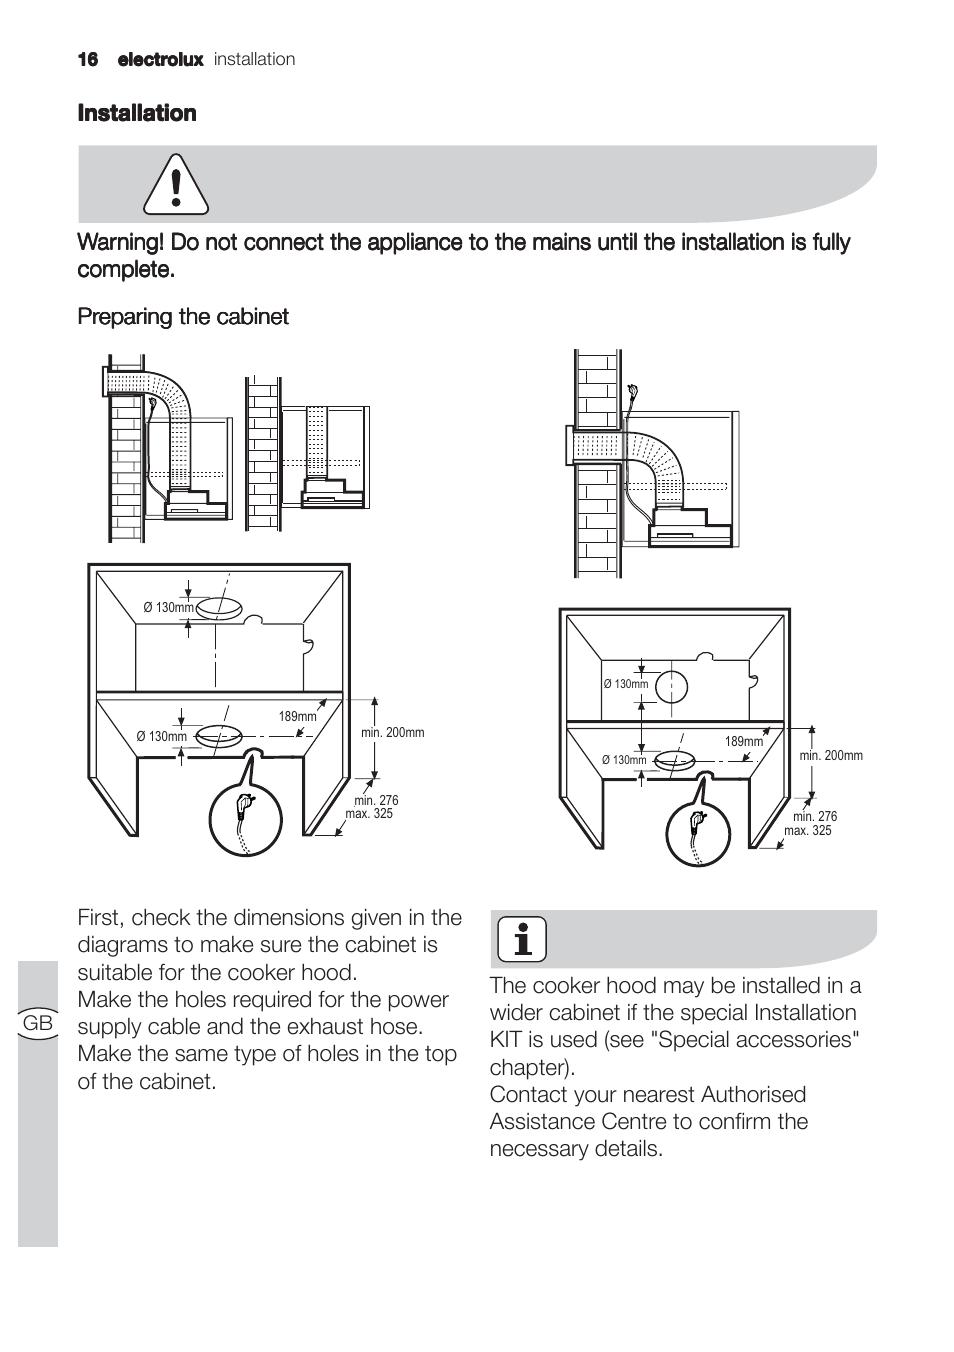 electrolux efp 60310 user manual page 16 24 original mode rh manualsdir com electrolux cooker hood troubleshooting electrolux range hood manual